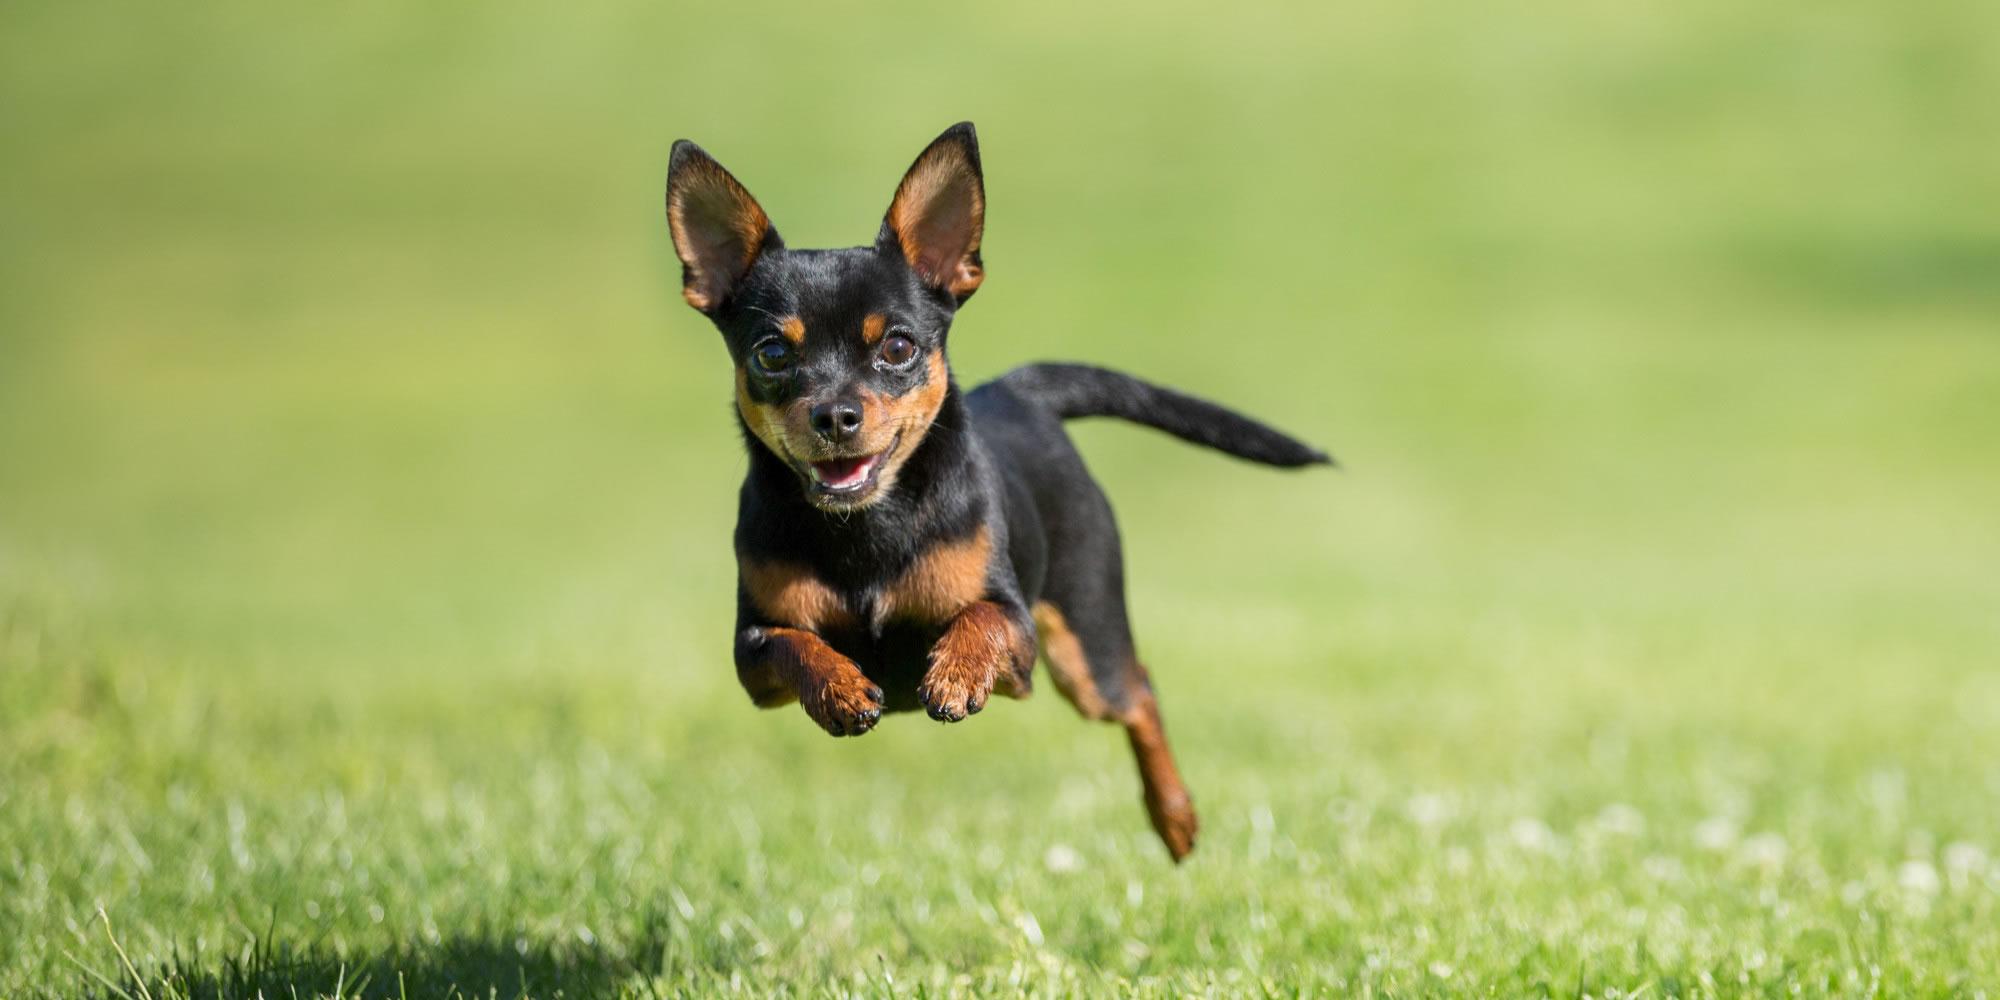 Chihuahua - My Doggy Rocks